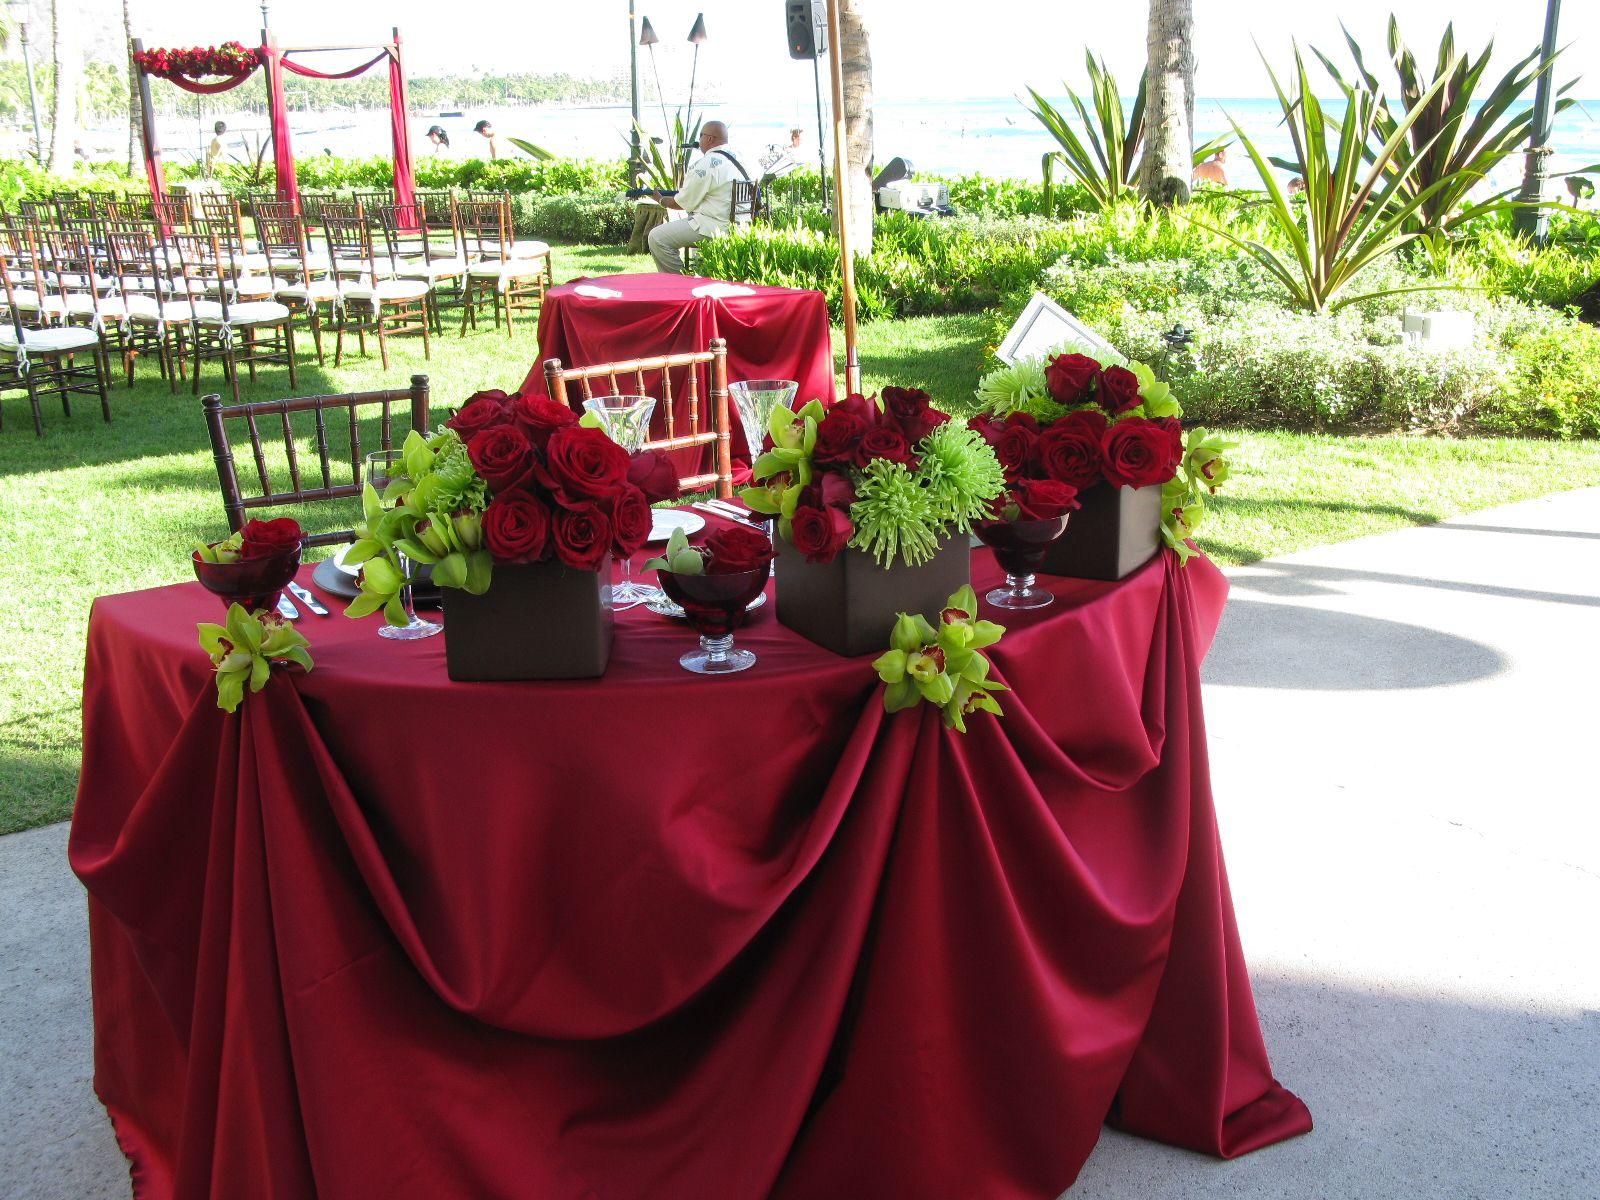 Sweetheart Table Flower Ideas (Red & Green)